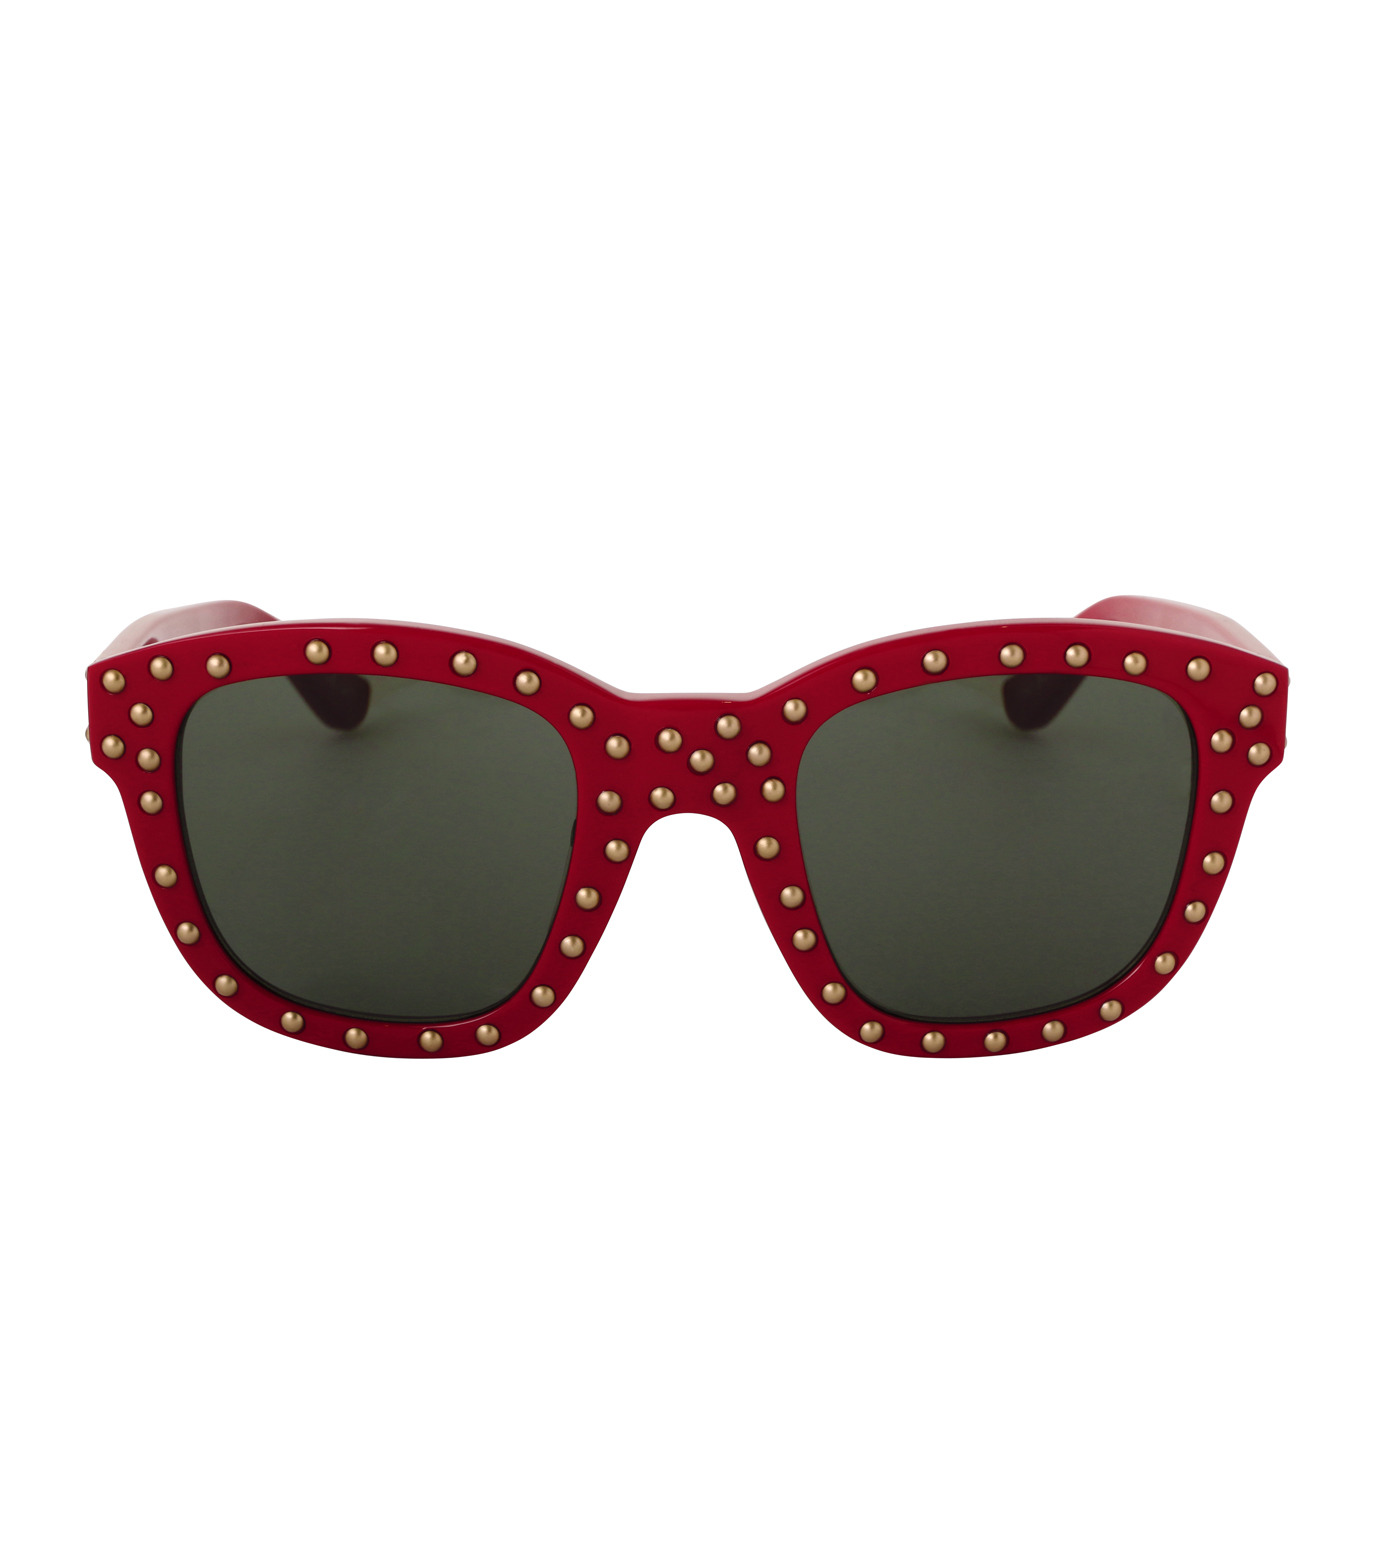 SAINT LAURENT(サンローラン)のSL 100 Lou Studded-RED(アイウェア/eyewear)-420137-62 拡大詳細画像3